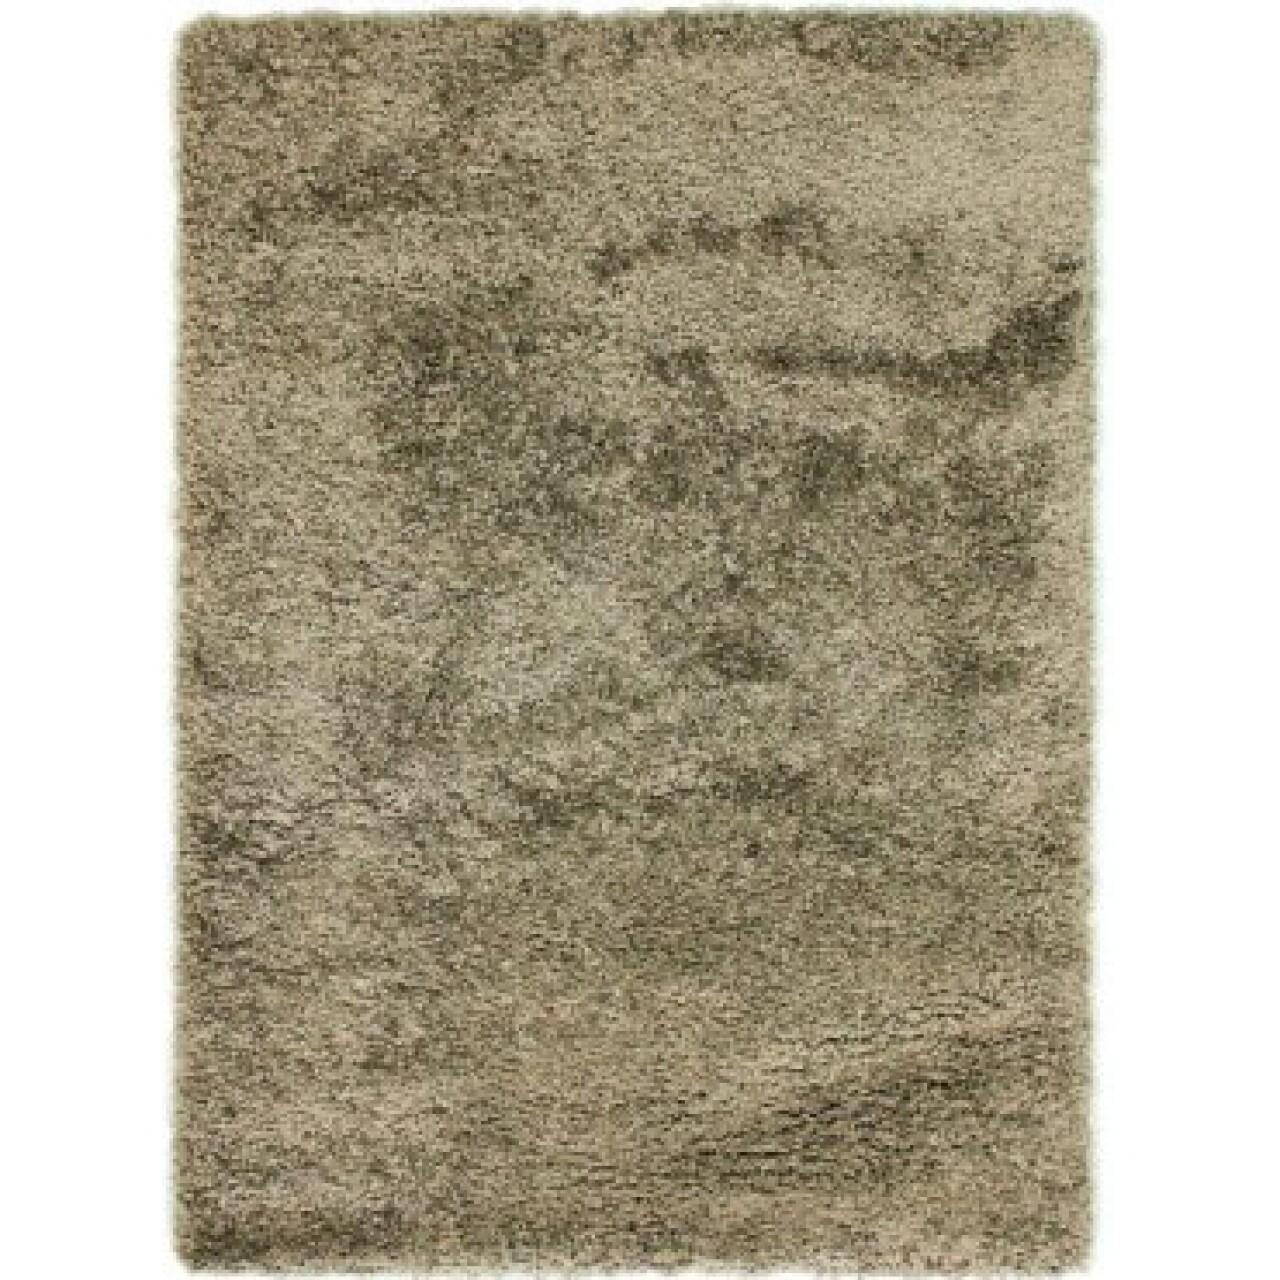 Covor Athena Taupe, Flair Rugs, 120x170 cm, 100% polipropilena, verde